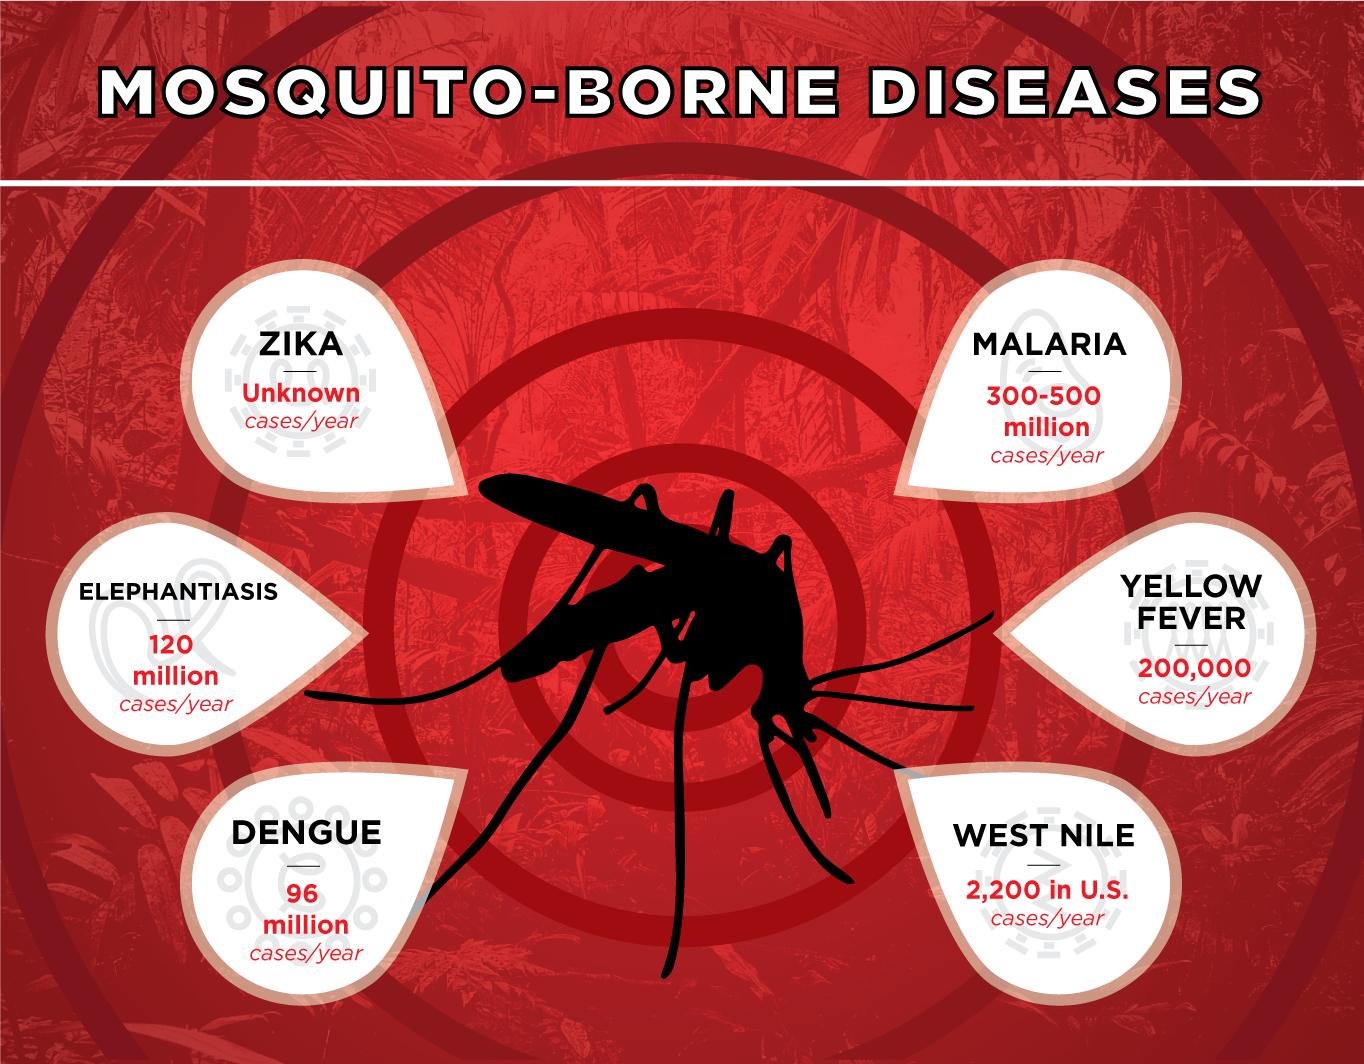 Dengue Fever Infects La Fte De >> Mosquito Borne Disease Zika Unknown Cases Year Malaria 300 500